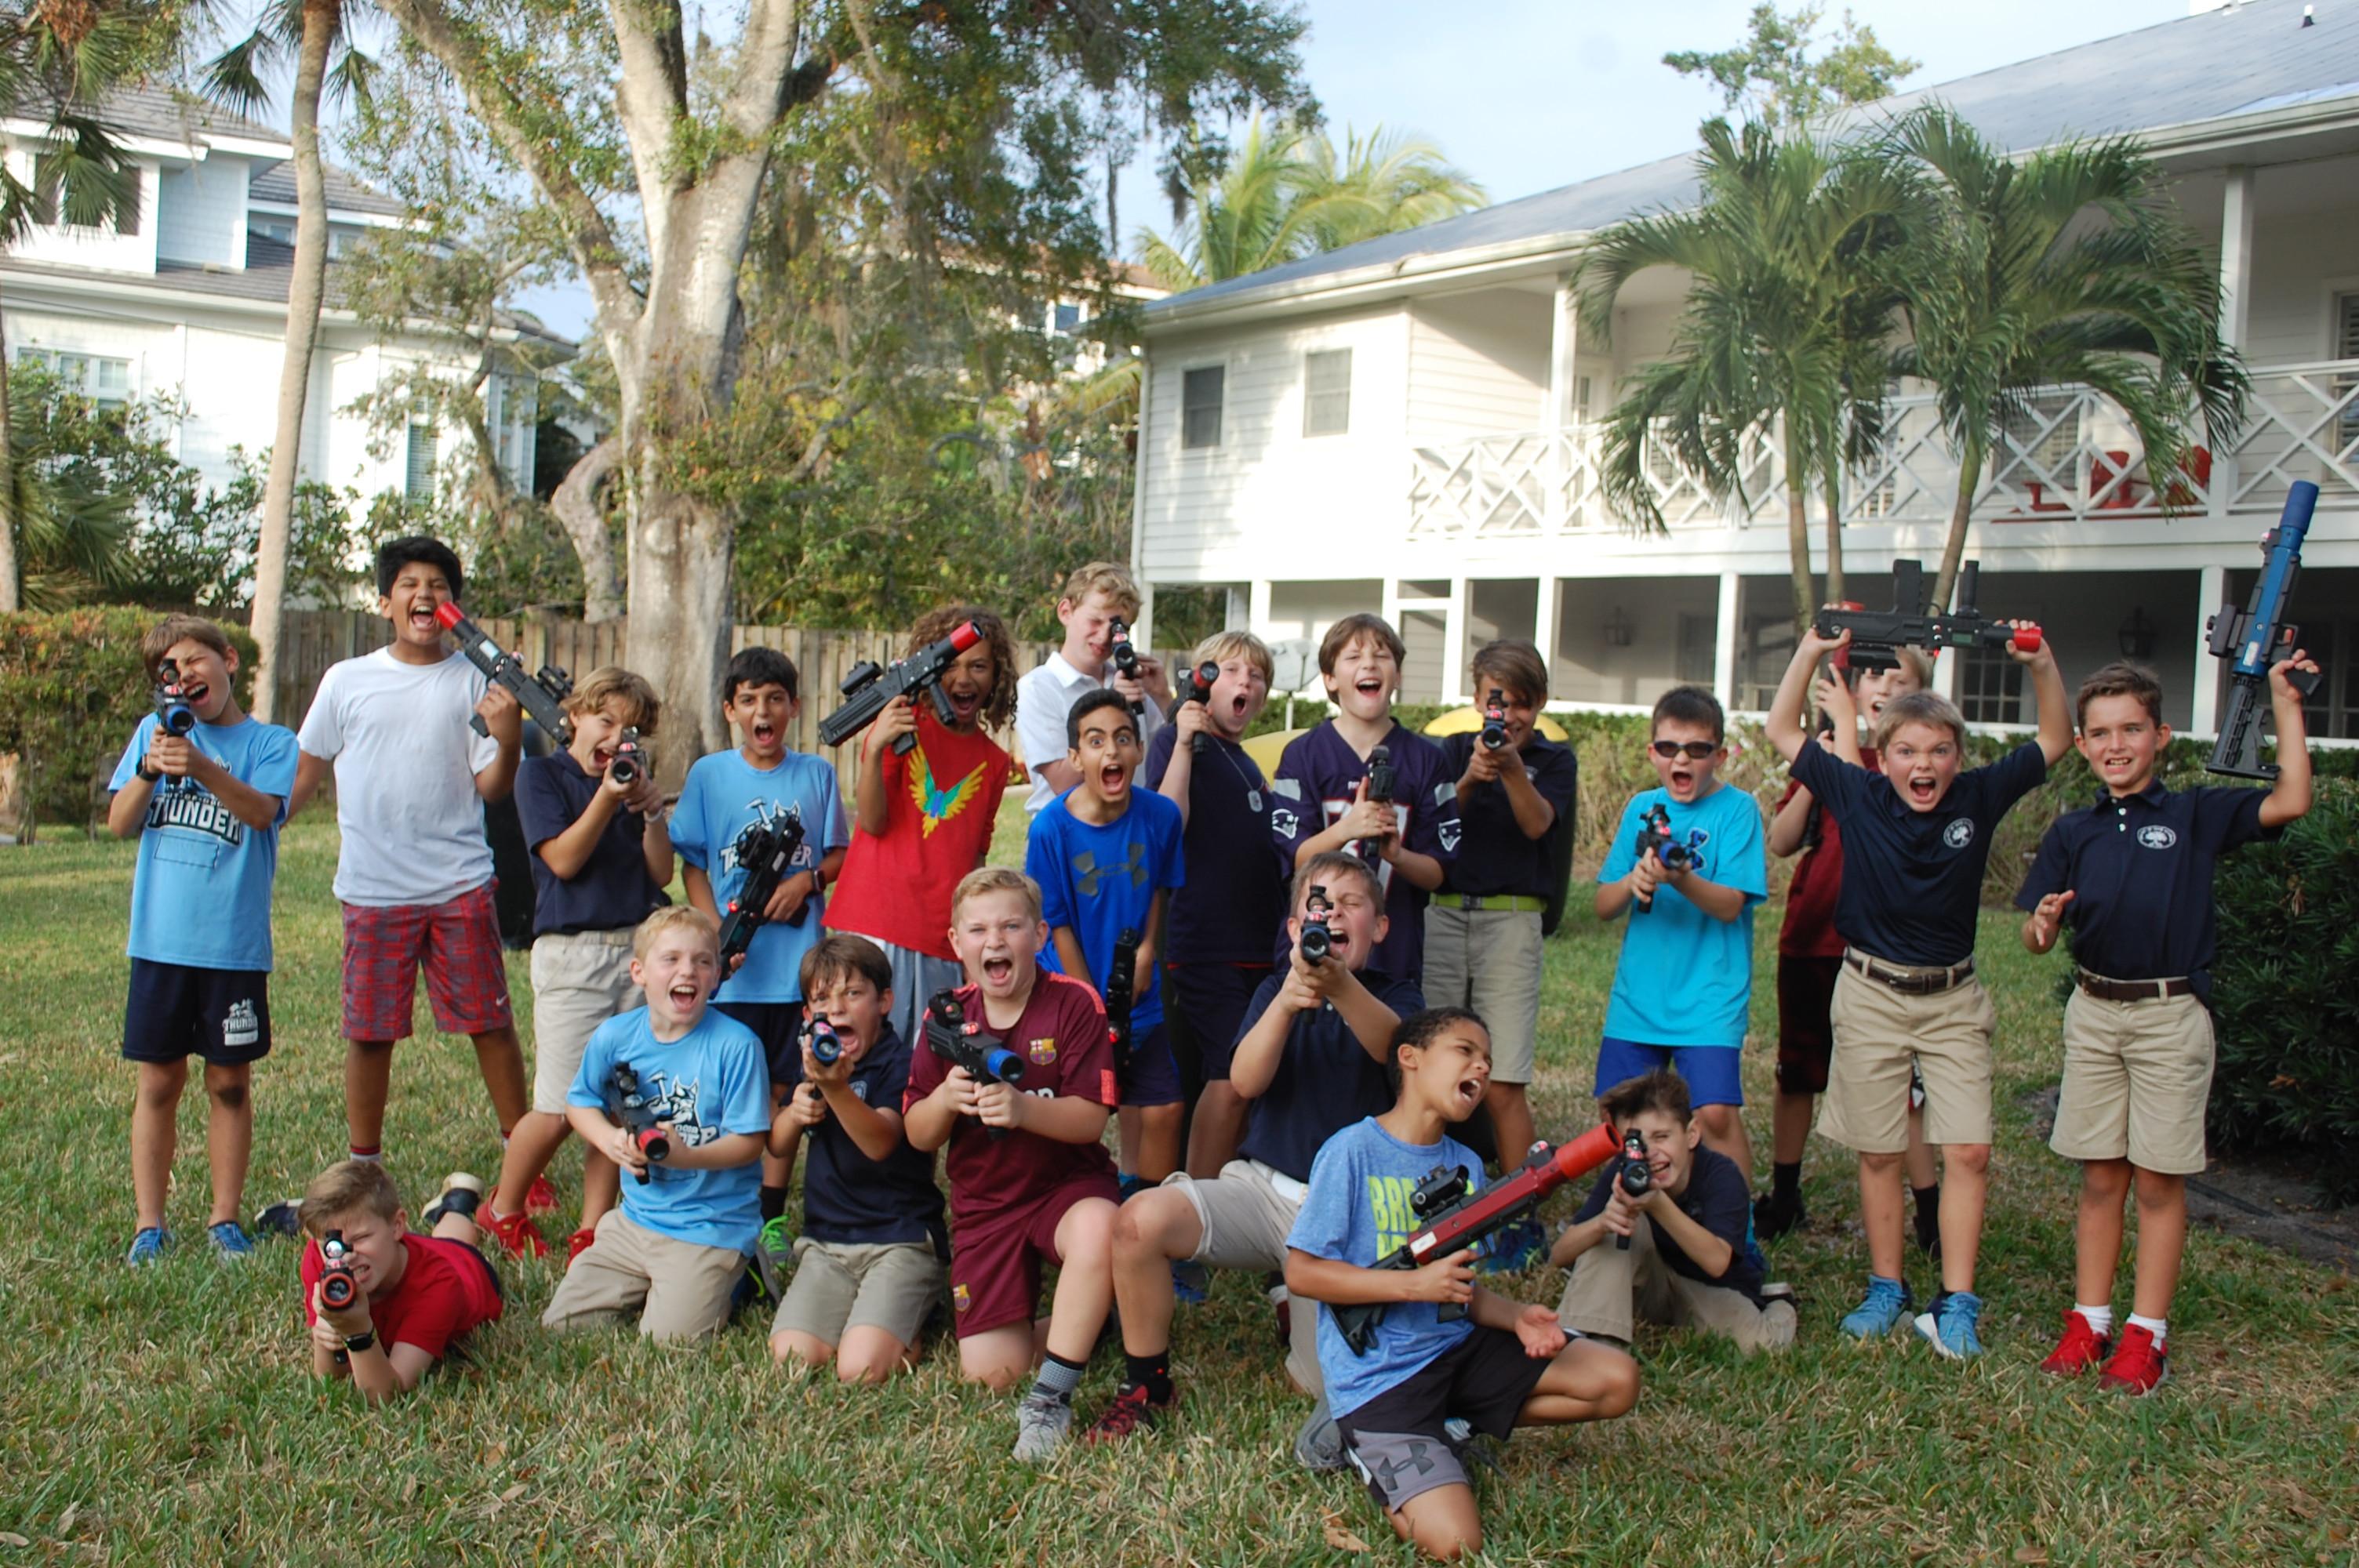 Birthday Party Ideas in Punta Gorda